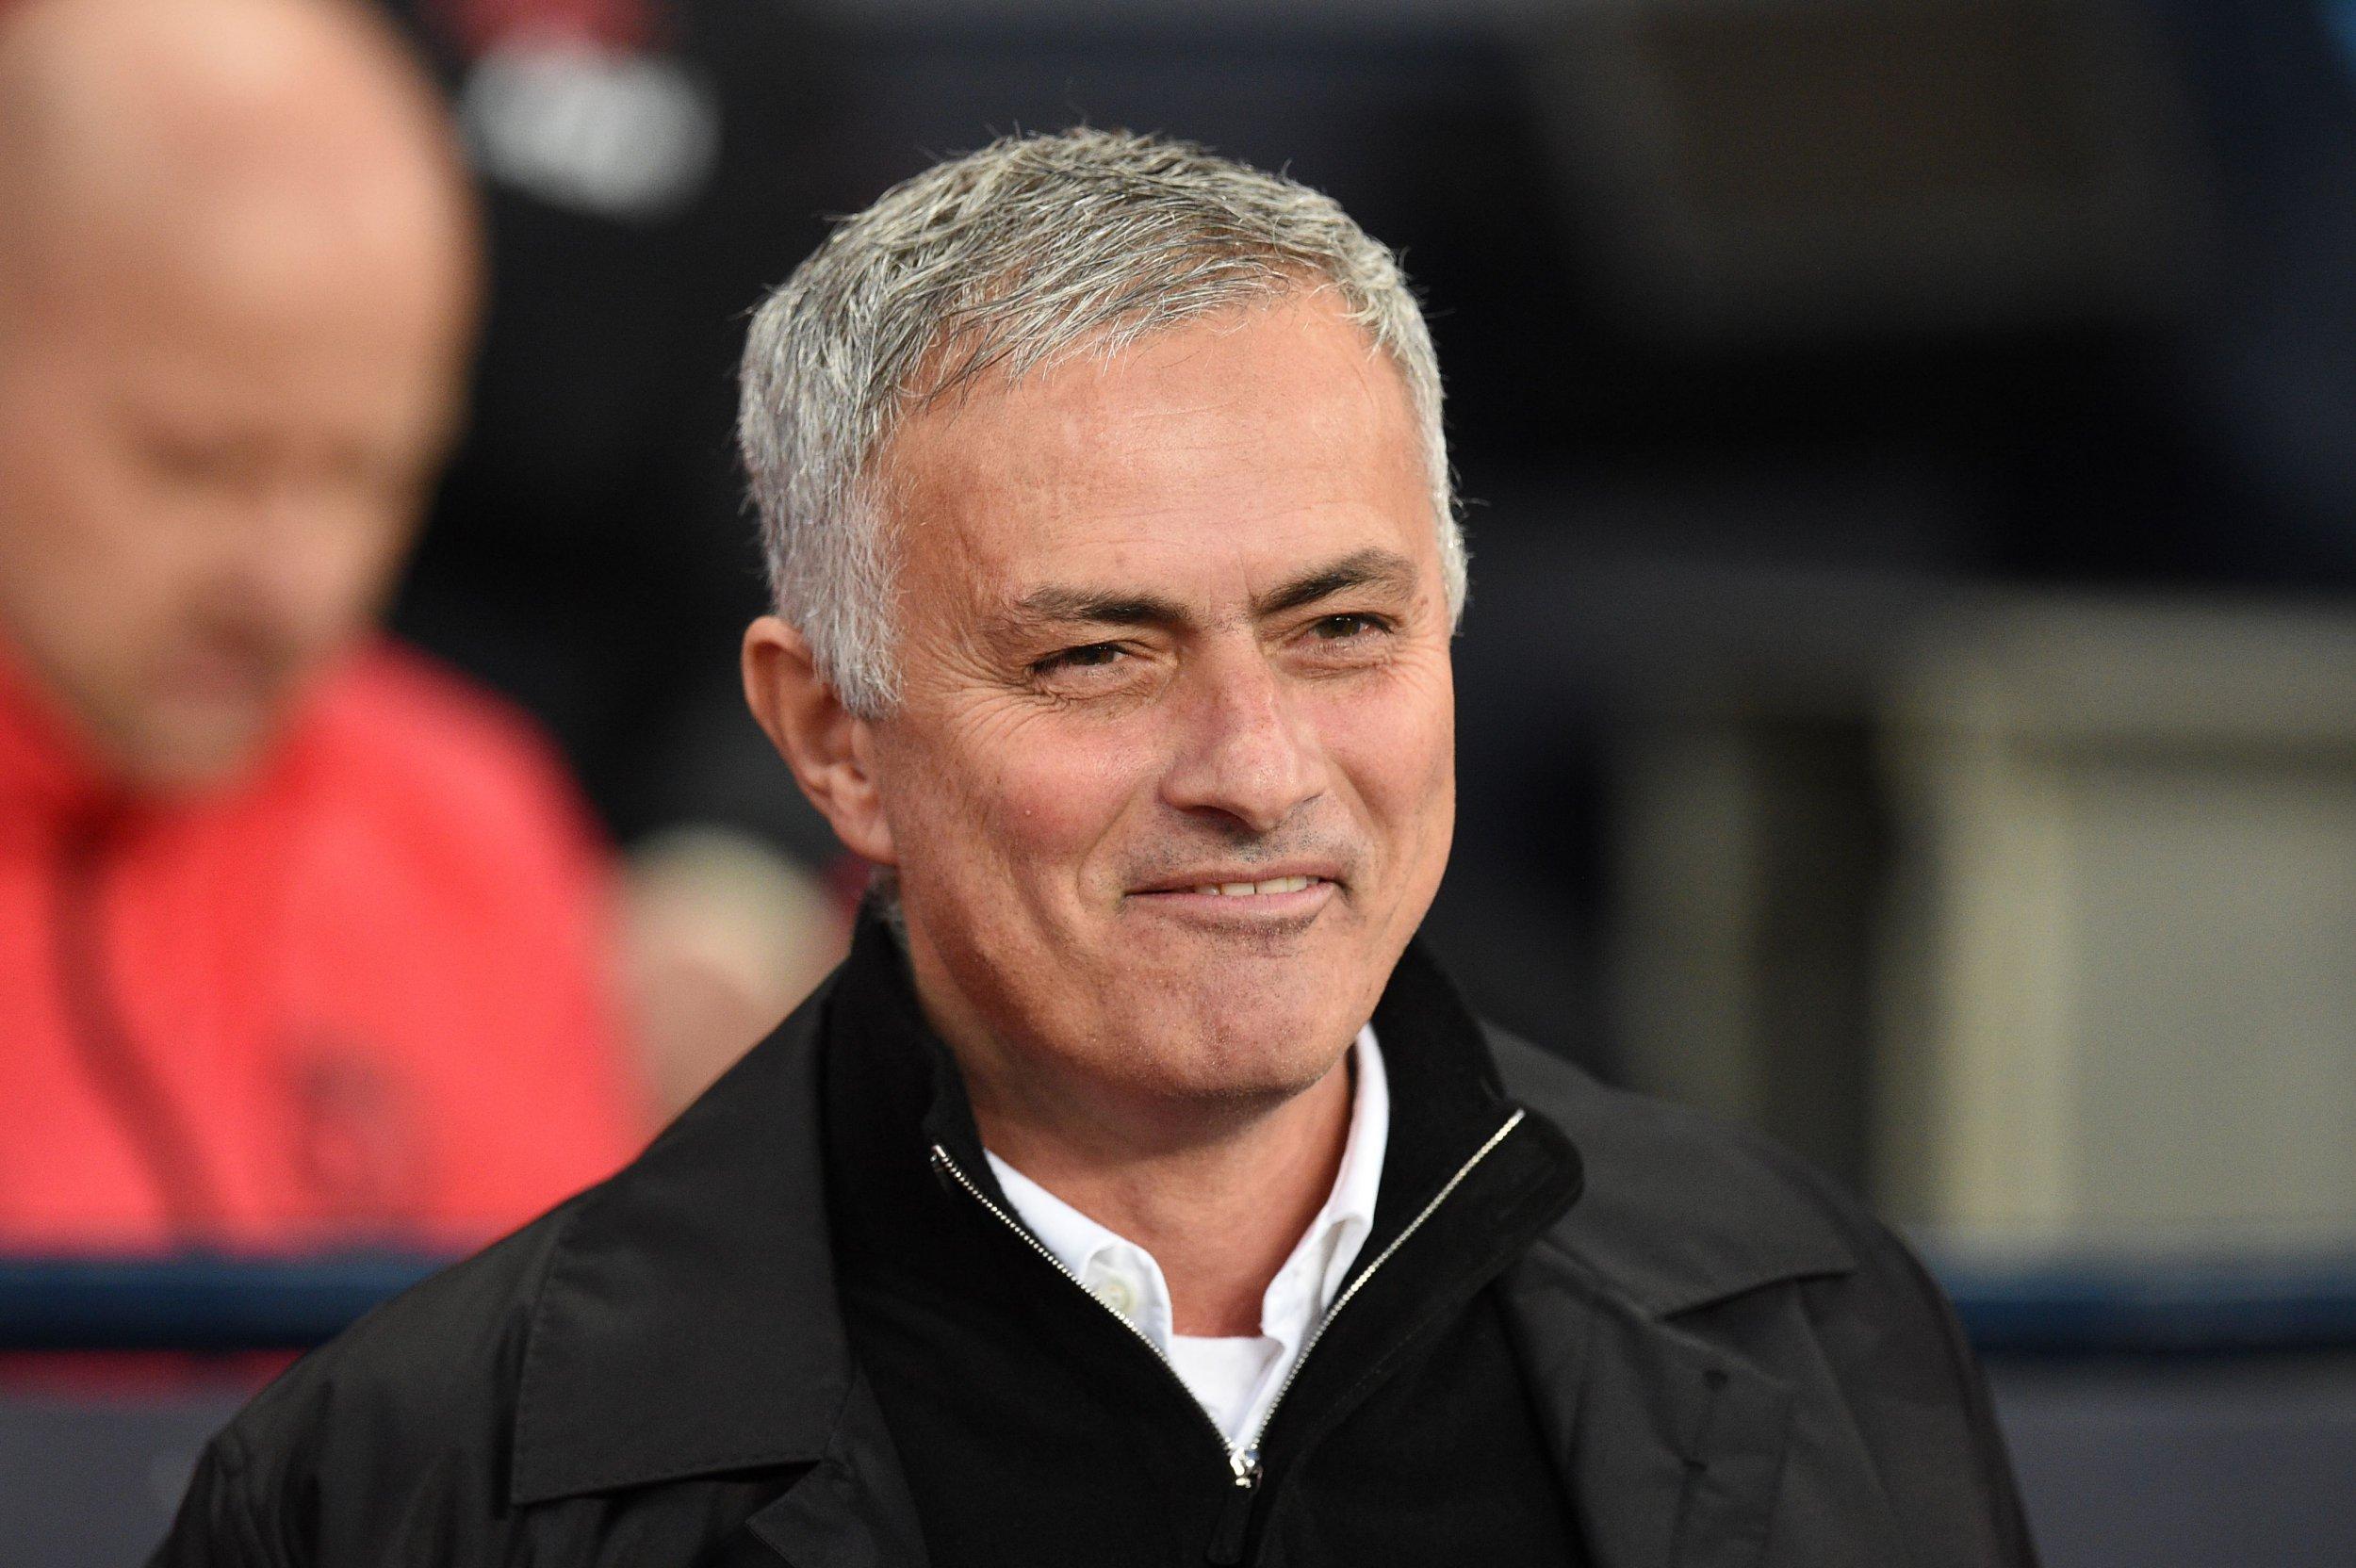 Jose Mourinho targeting Eder Militao as alternative signing to Kalidou Koulibaly for Manchester United